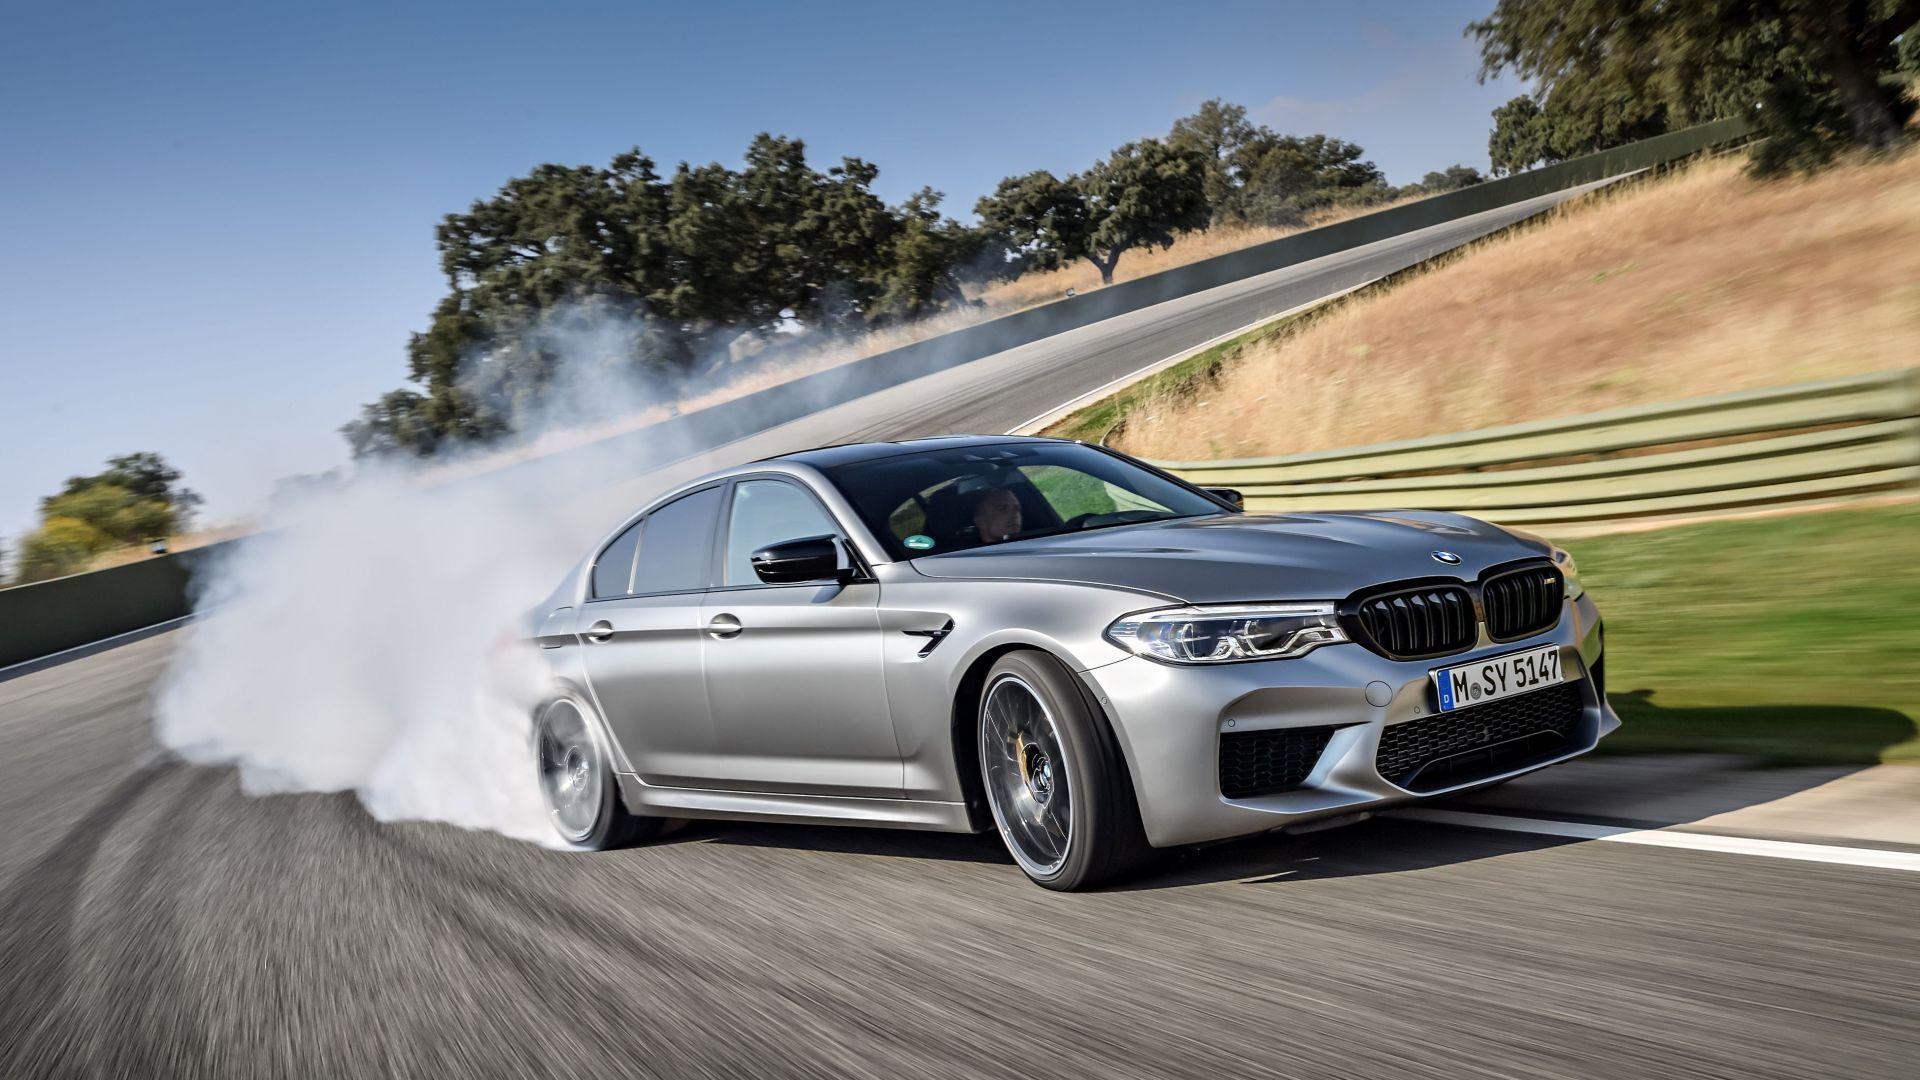 Best Luxury Sports Cars Of 2018 Best Luxury Sports Car Bmw M5 Sports Cars Luxury